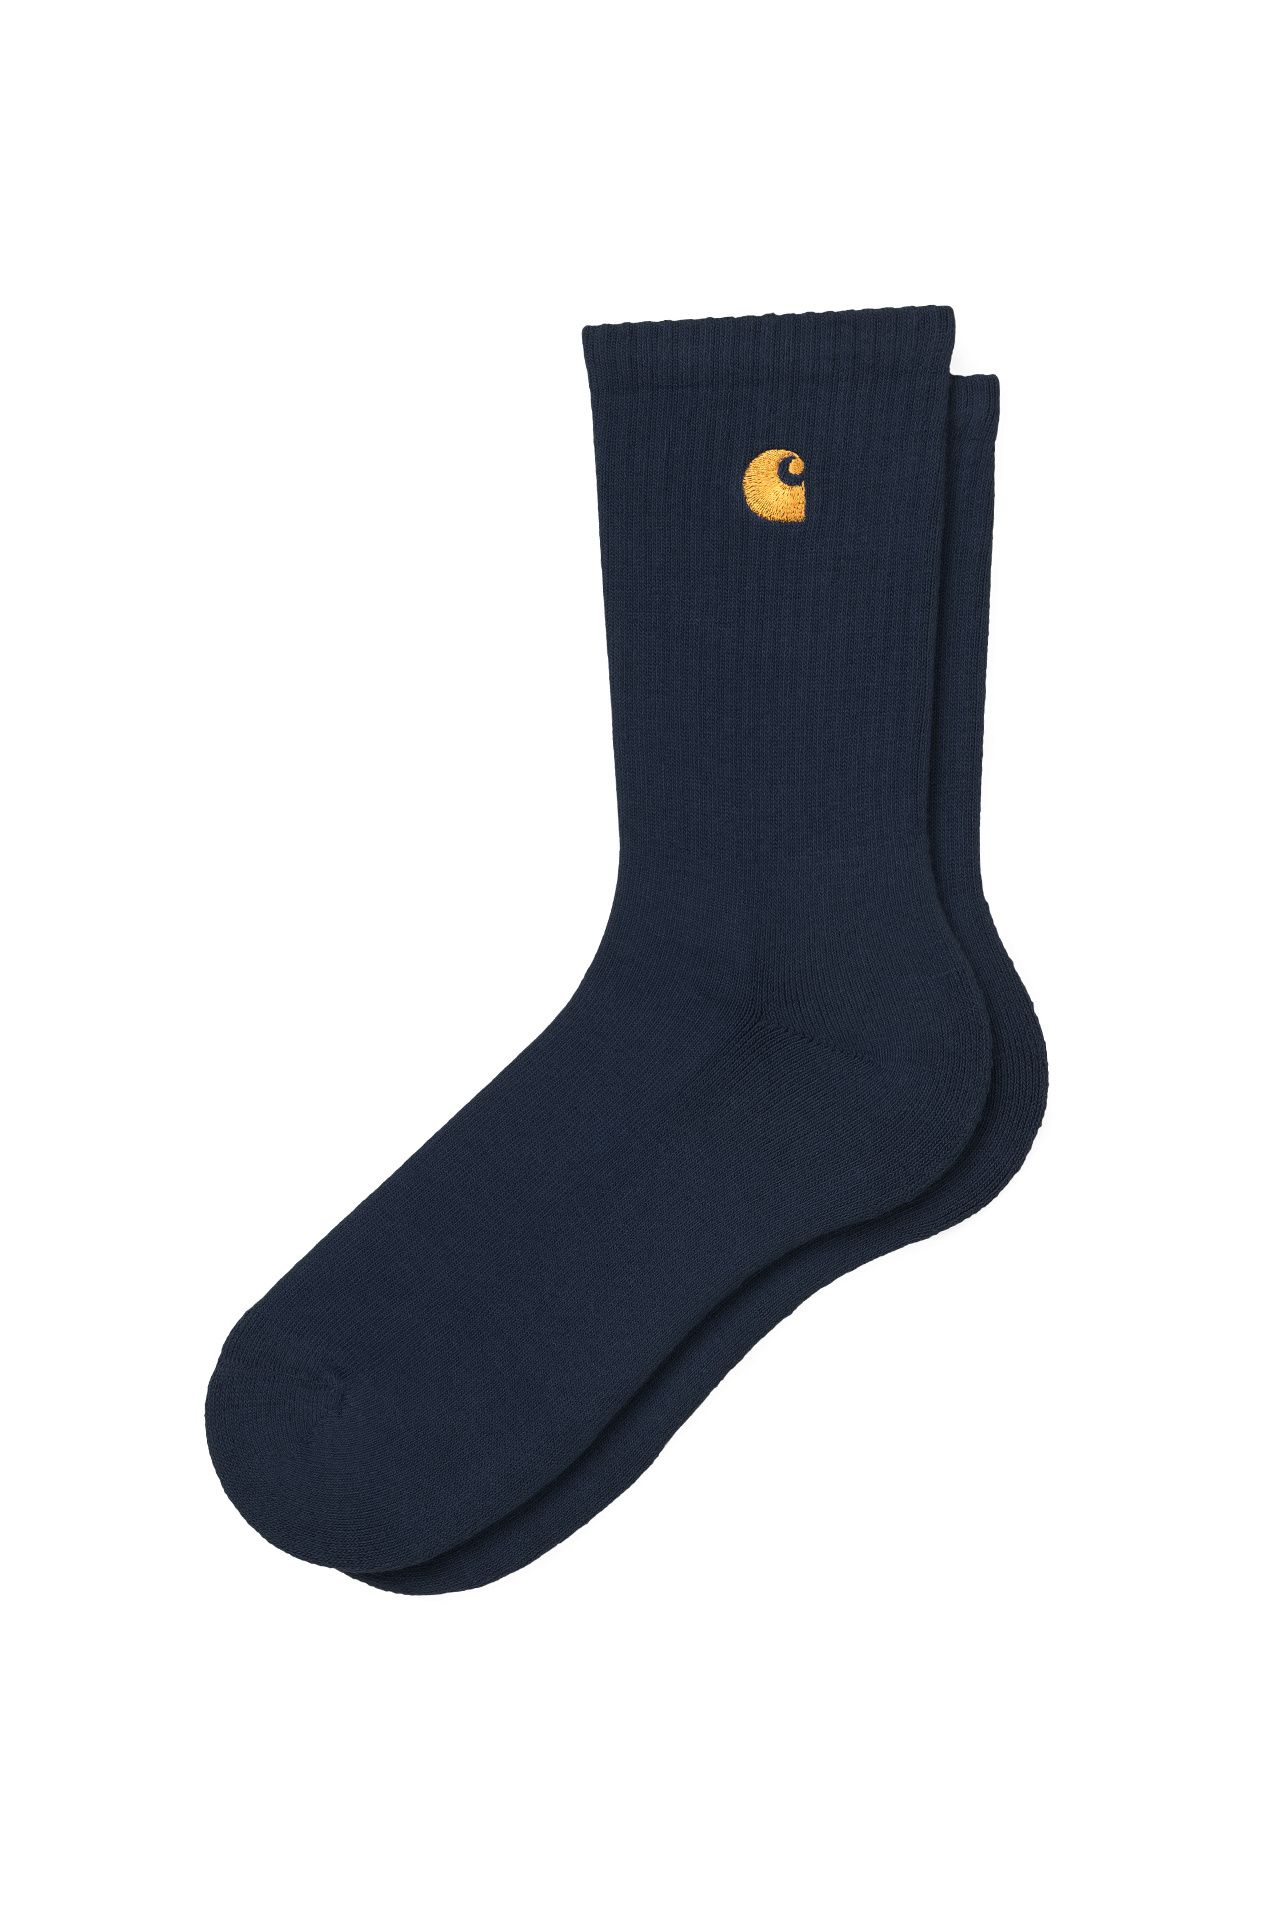 Afbeelding van Carhartt WIP Sokken Chase Socks Dark Navy/Gold I029421